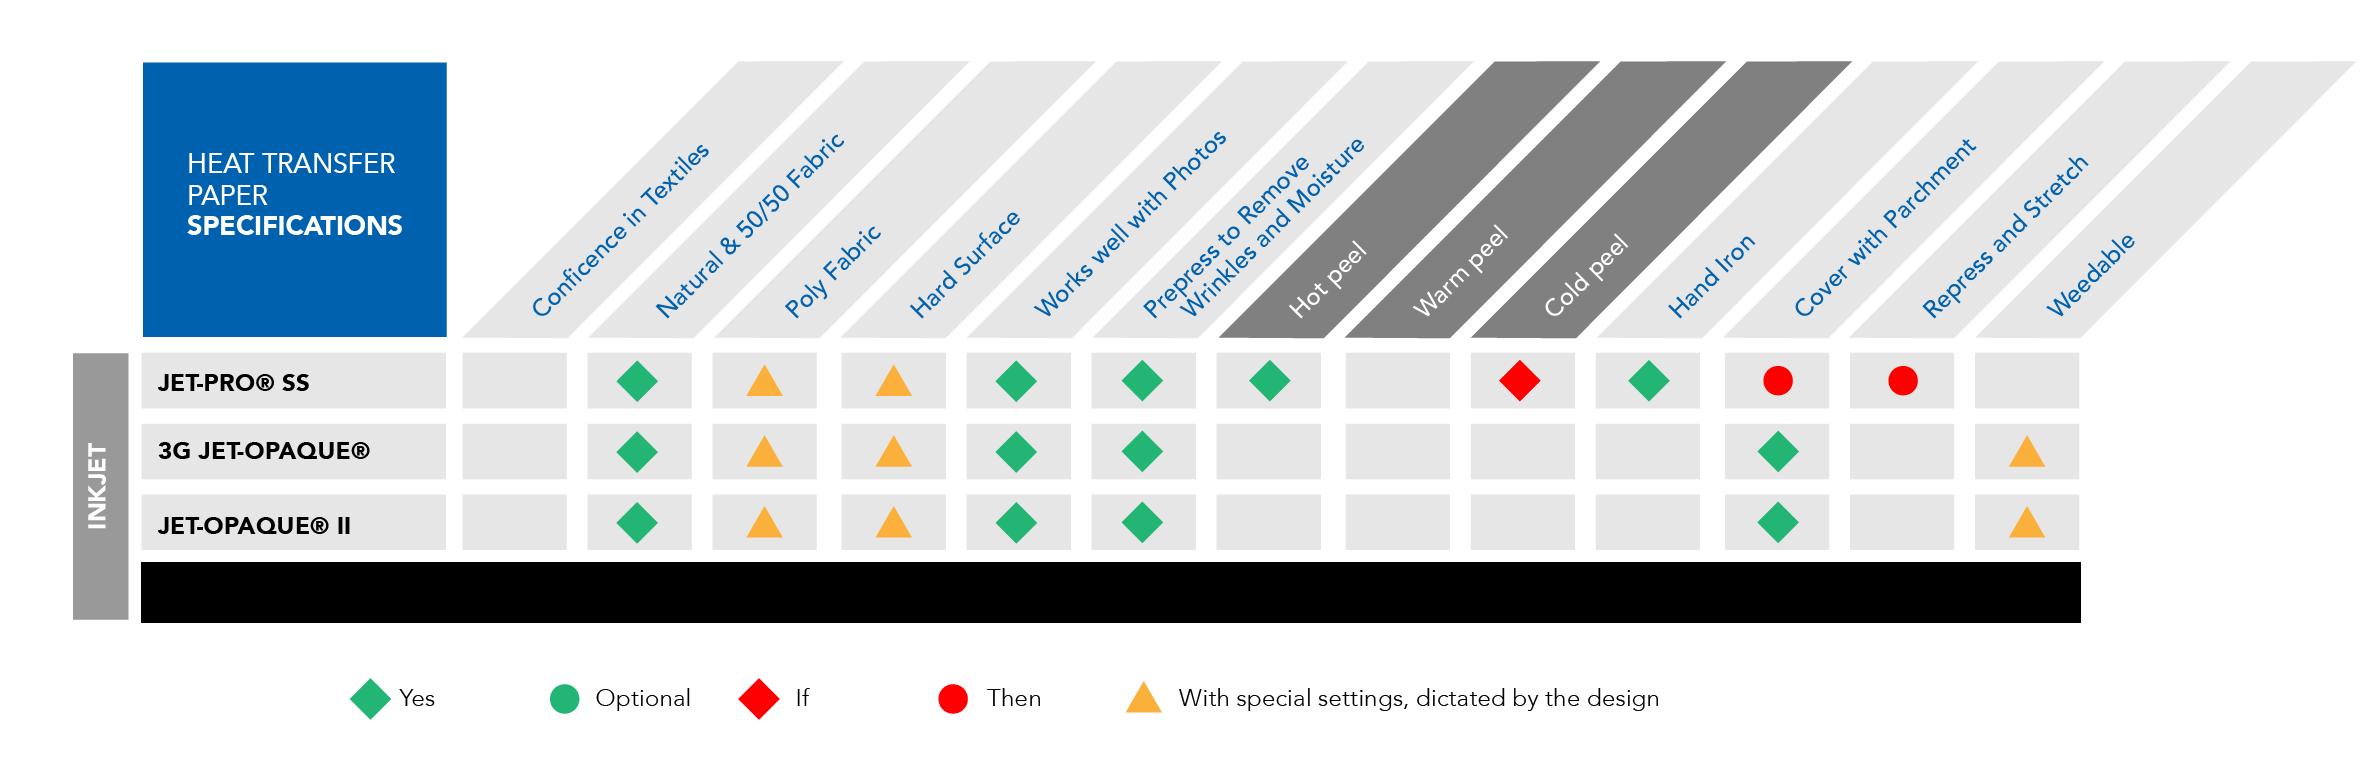 tpc-neenah-inkjet-paper-comparison-chart-specs.png